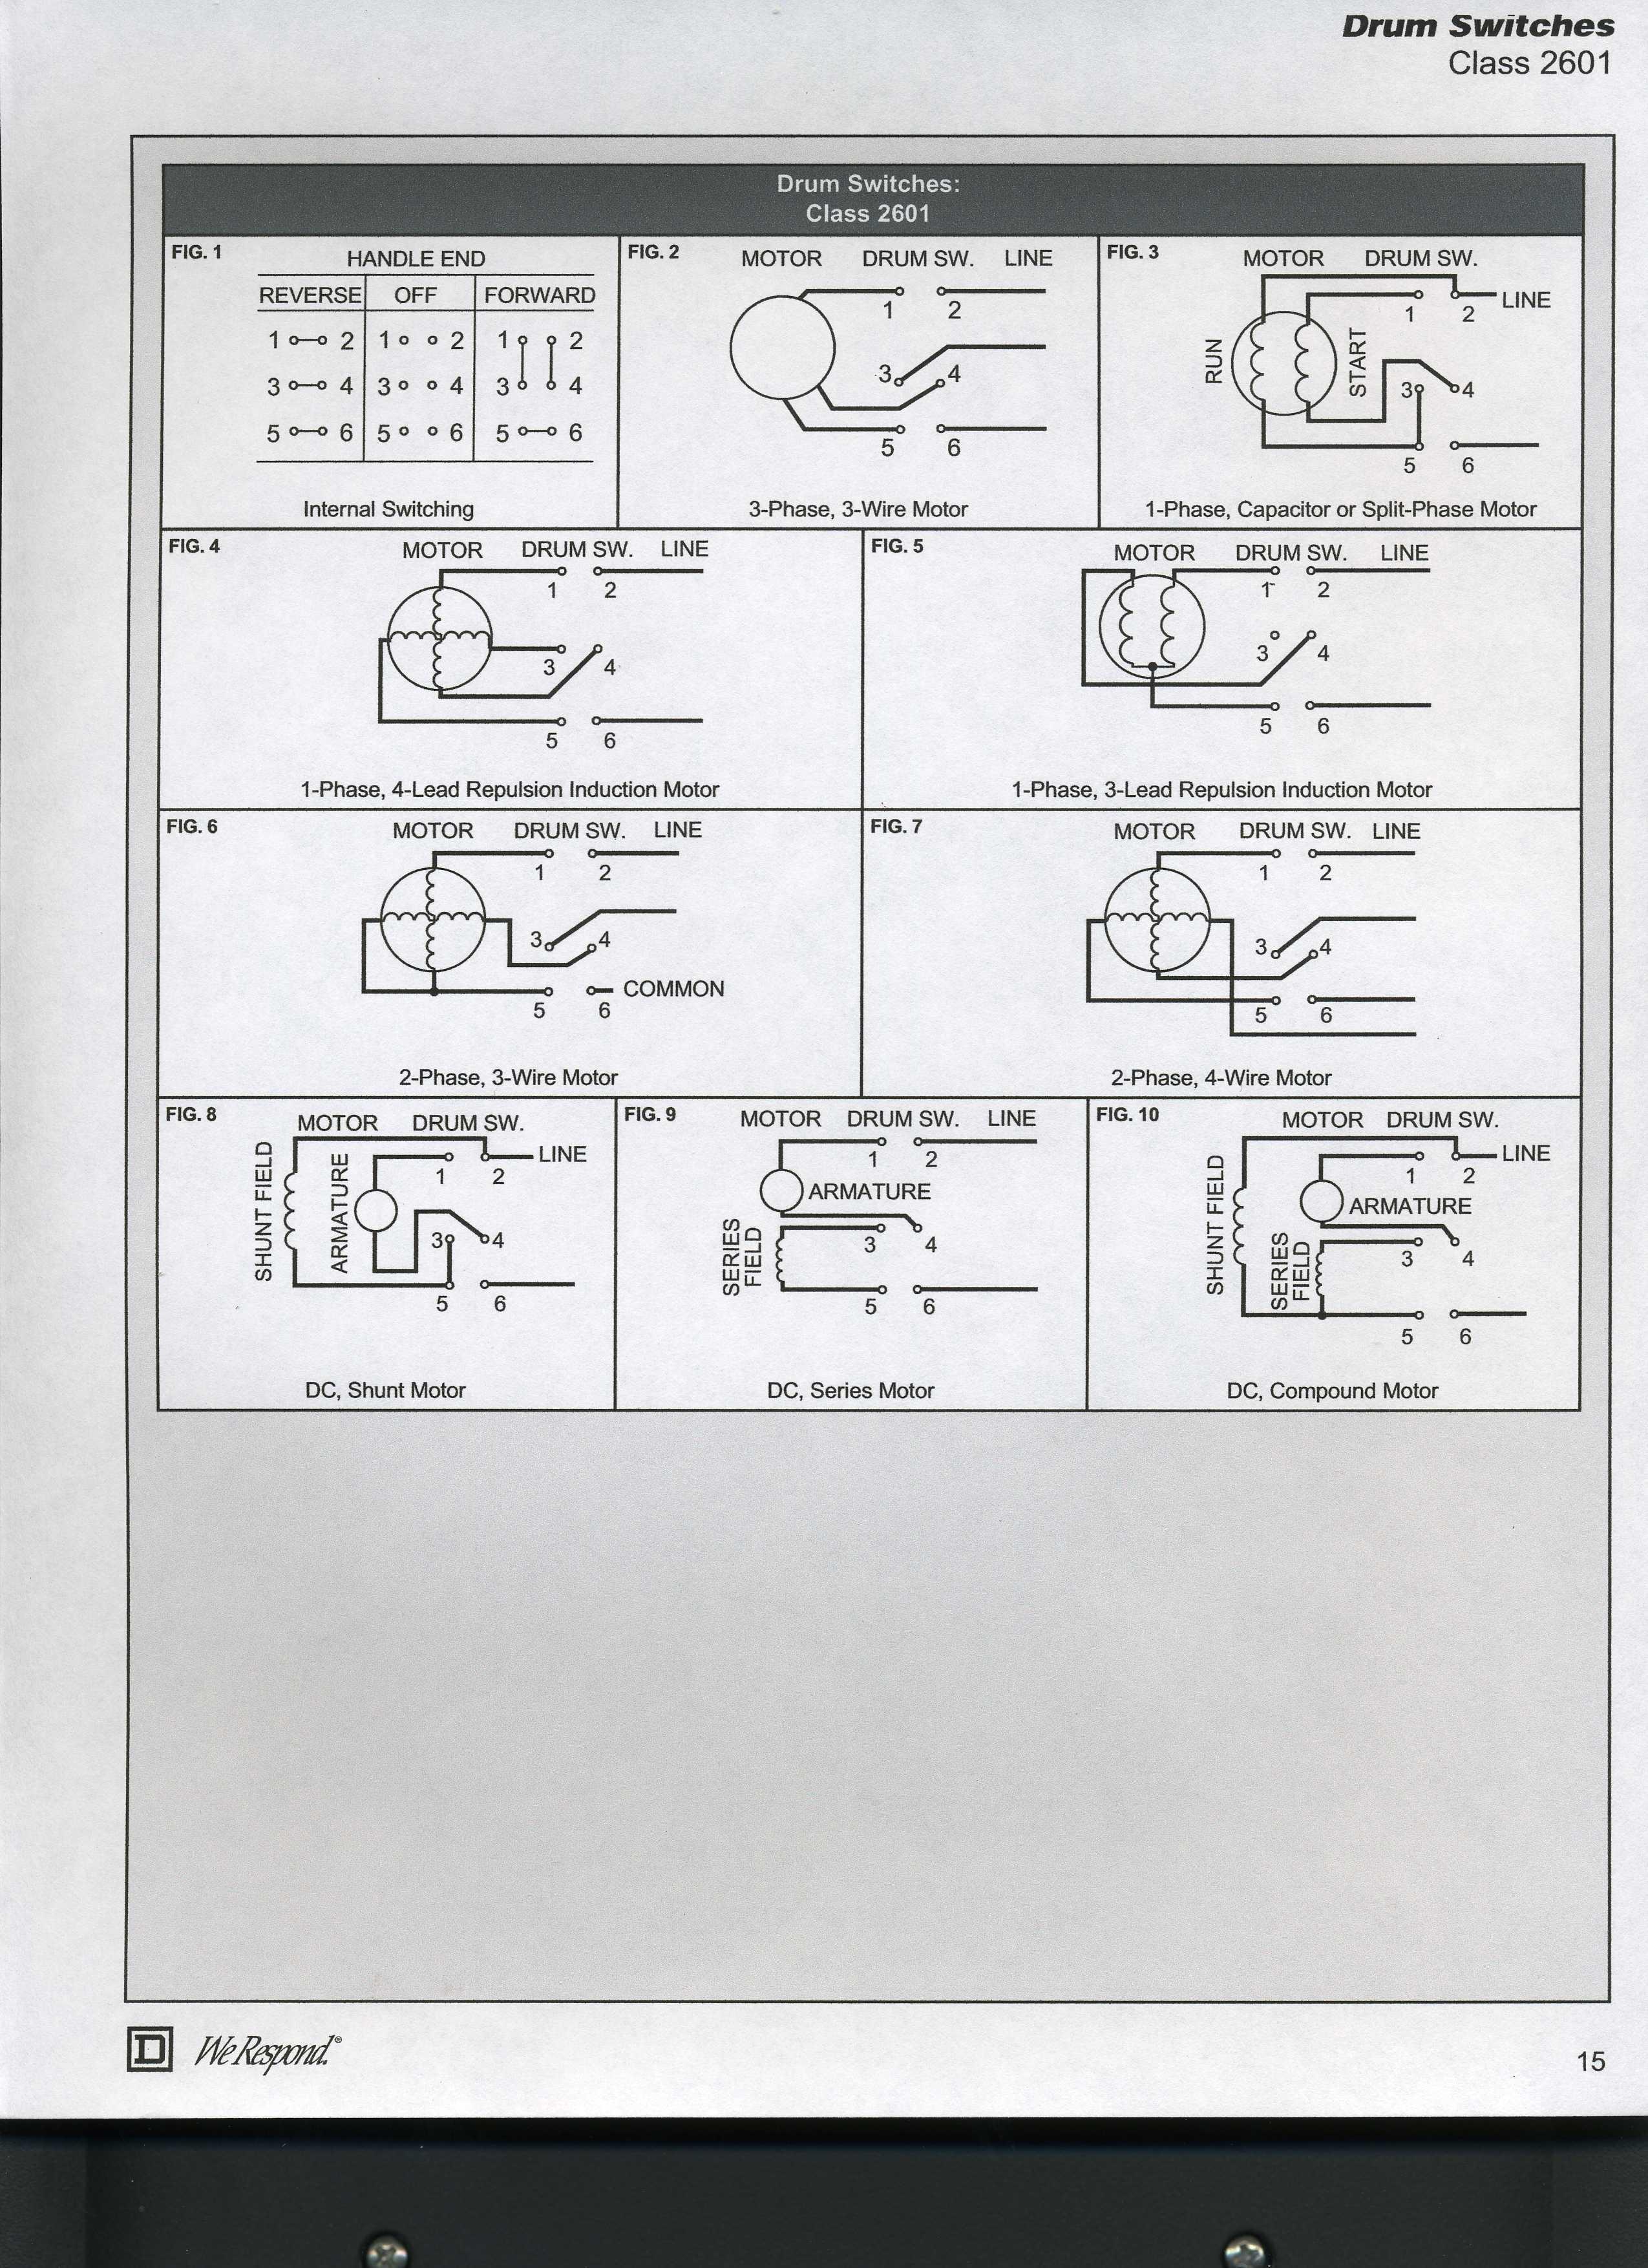 Funky 12 Lead Motor Wiring Gallery Wiring Diagram Ideas blogitiacom